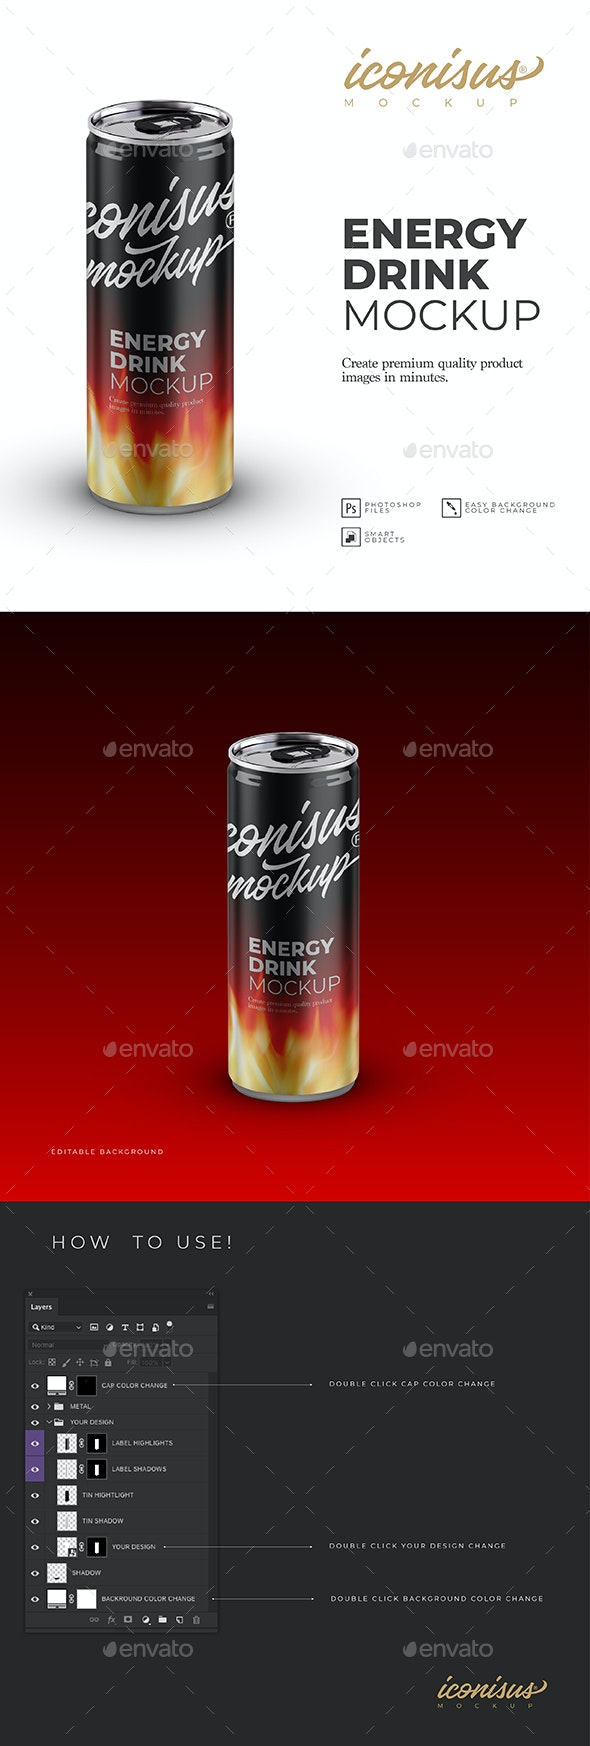 Energy Drink Mockup Template - Food and Drink Packaging